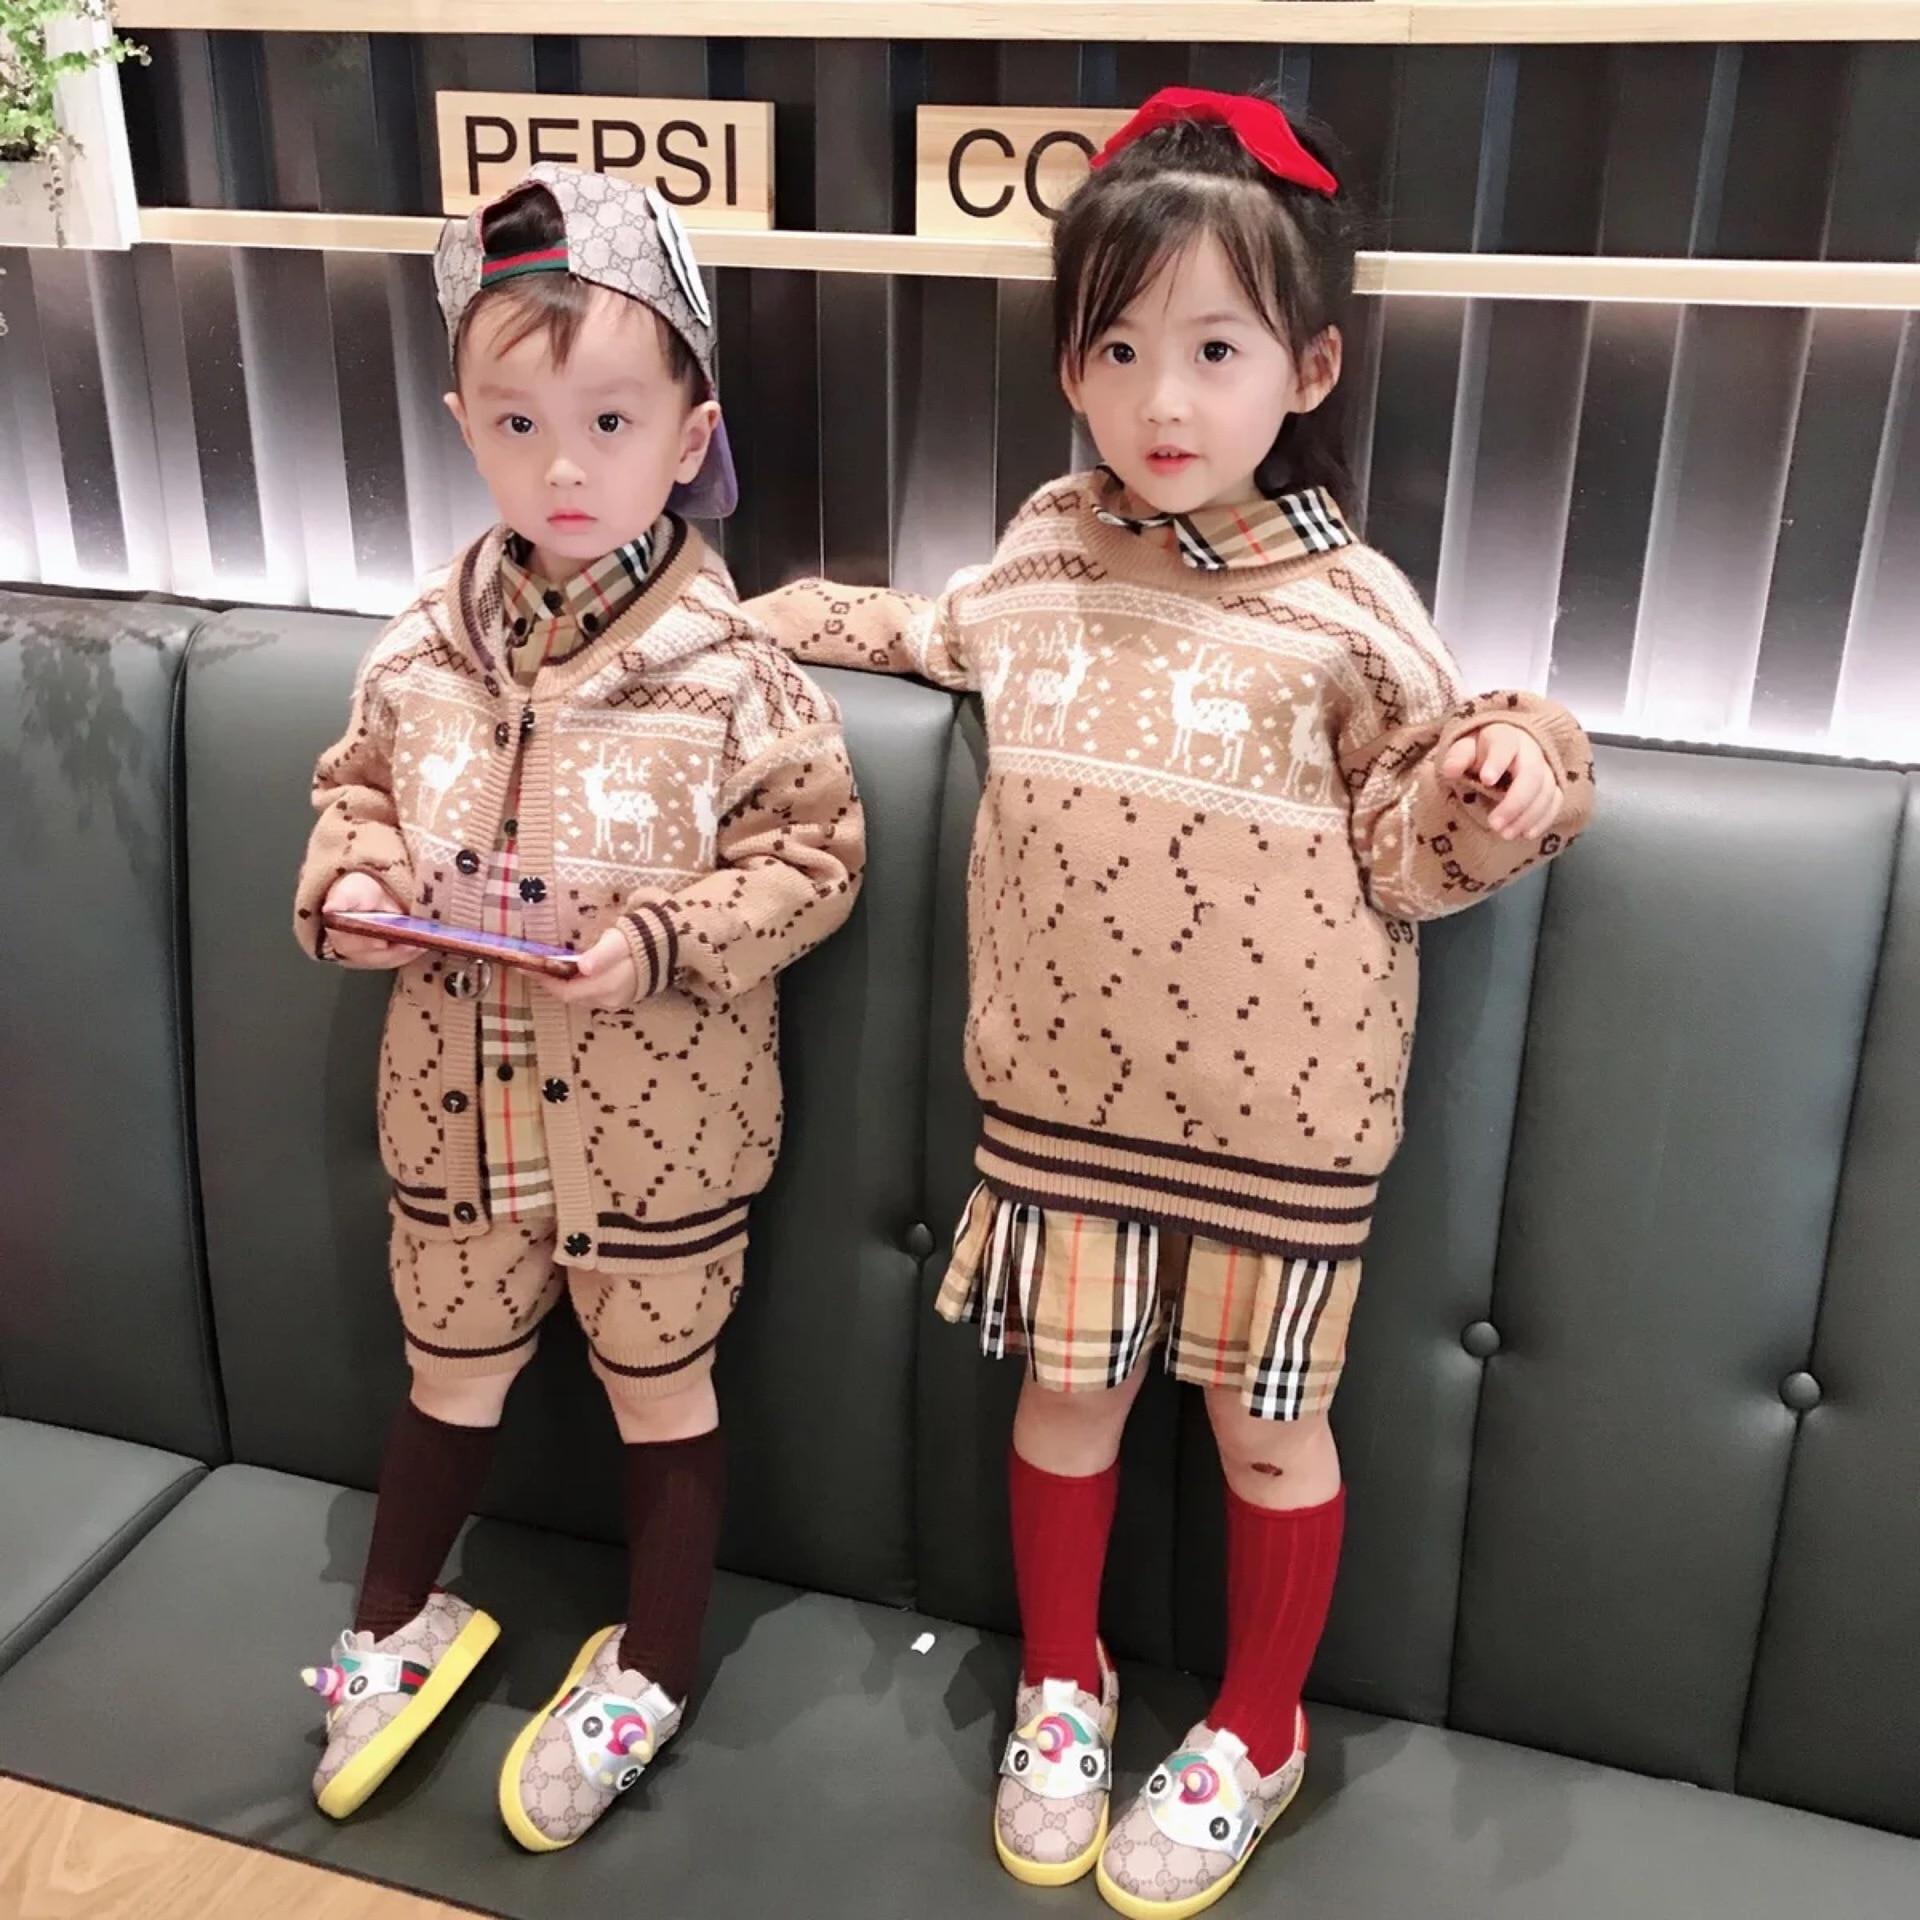 Boys' Sweater 2019 Spring And Autumn Cartoon Western Style Mink Cashmere Sweater Pullover Baby Children Crew Neck Sweater Fashio on AliExpress